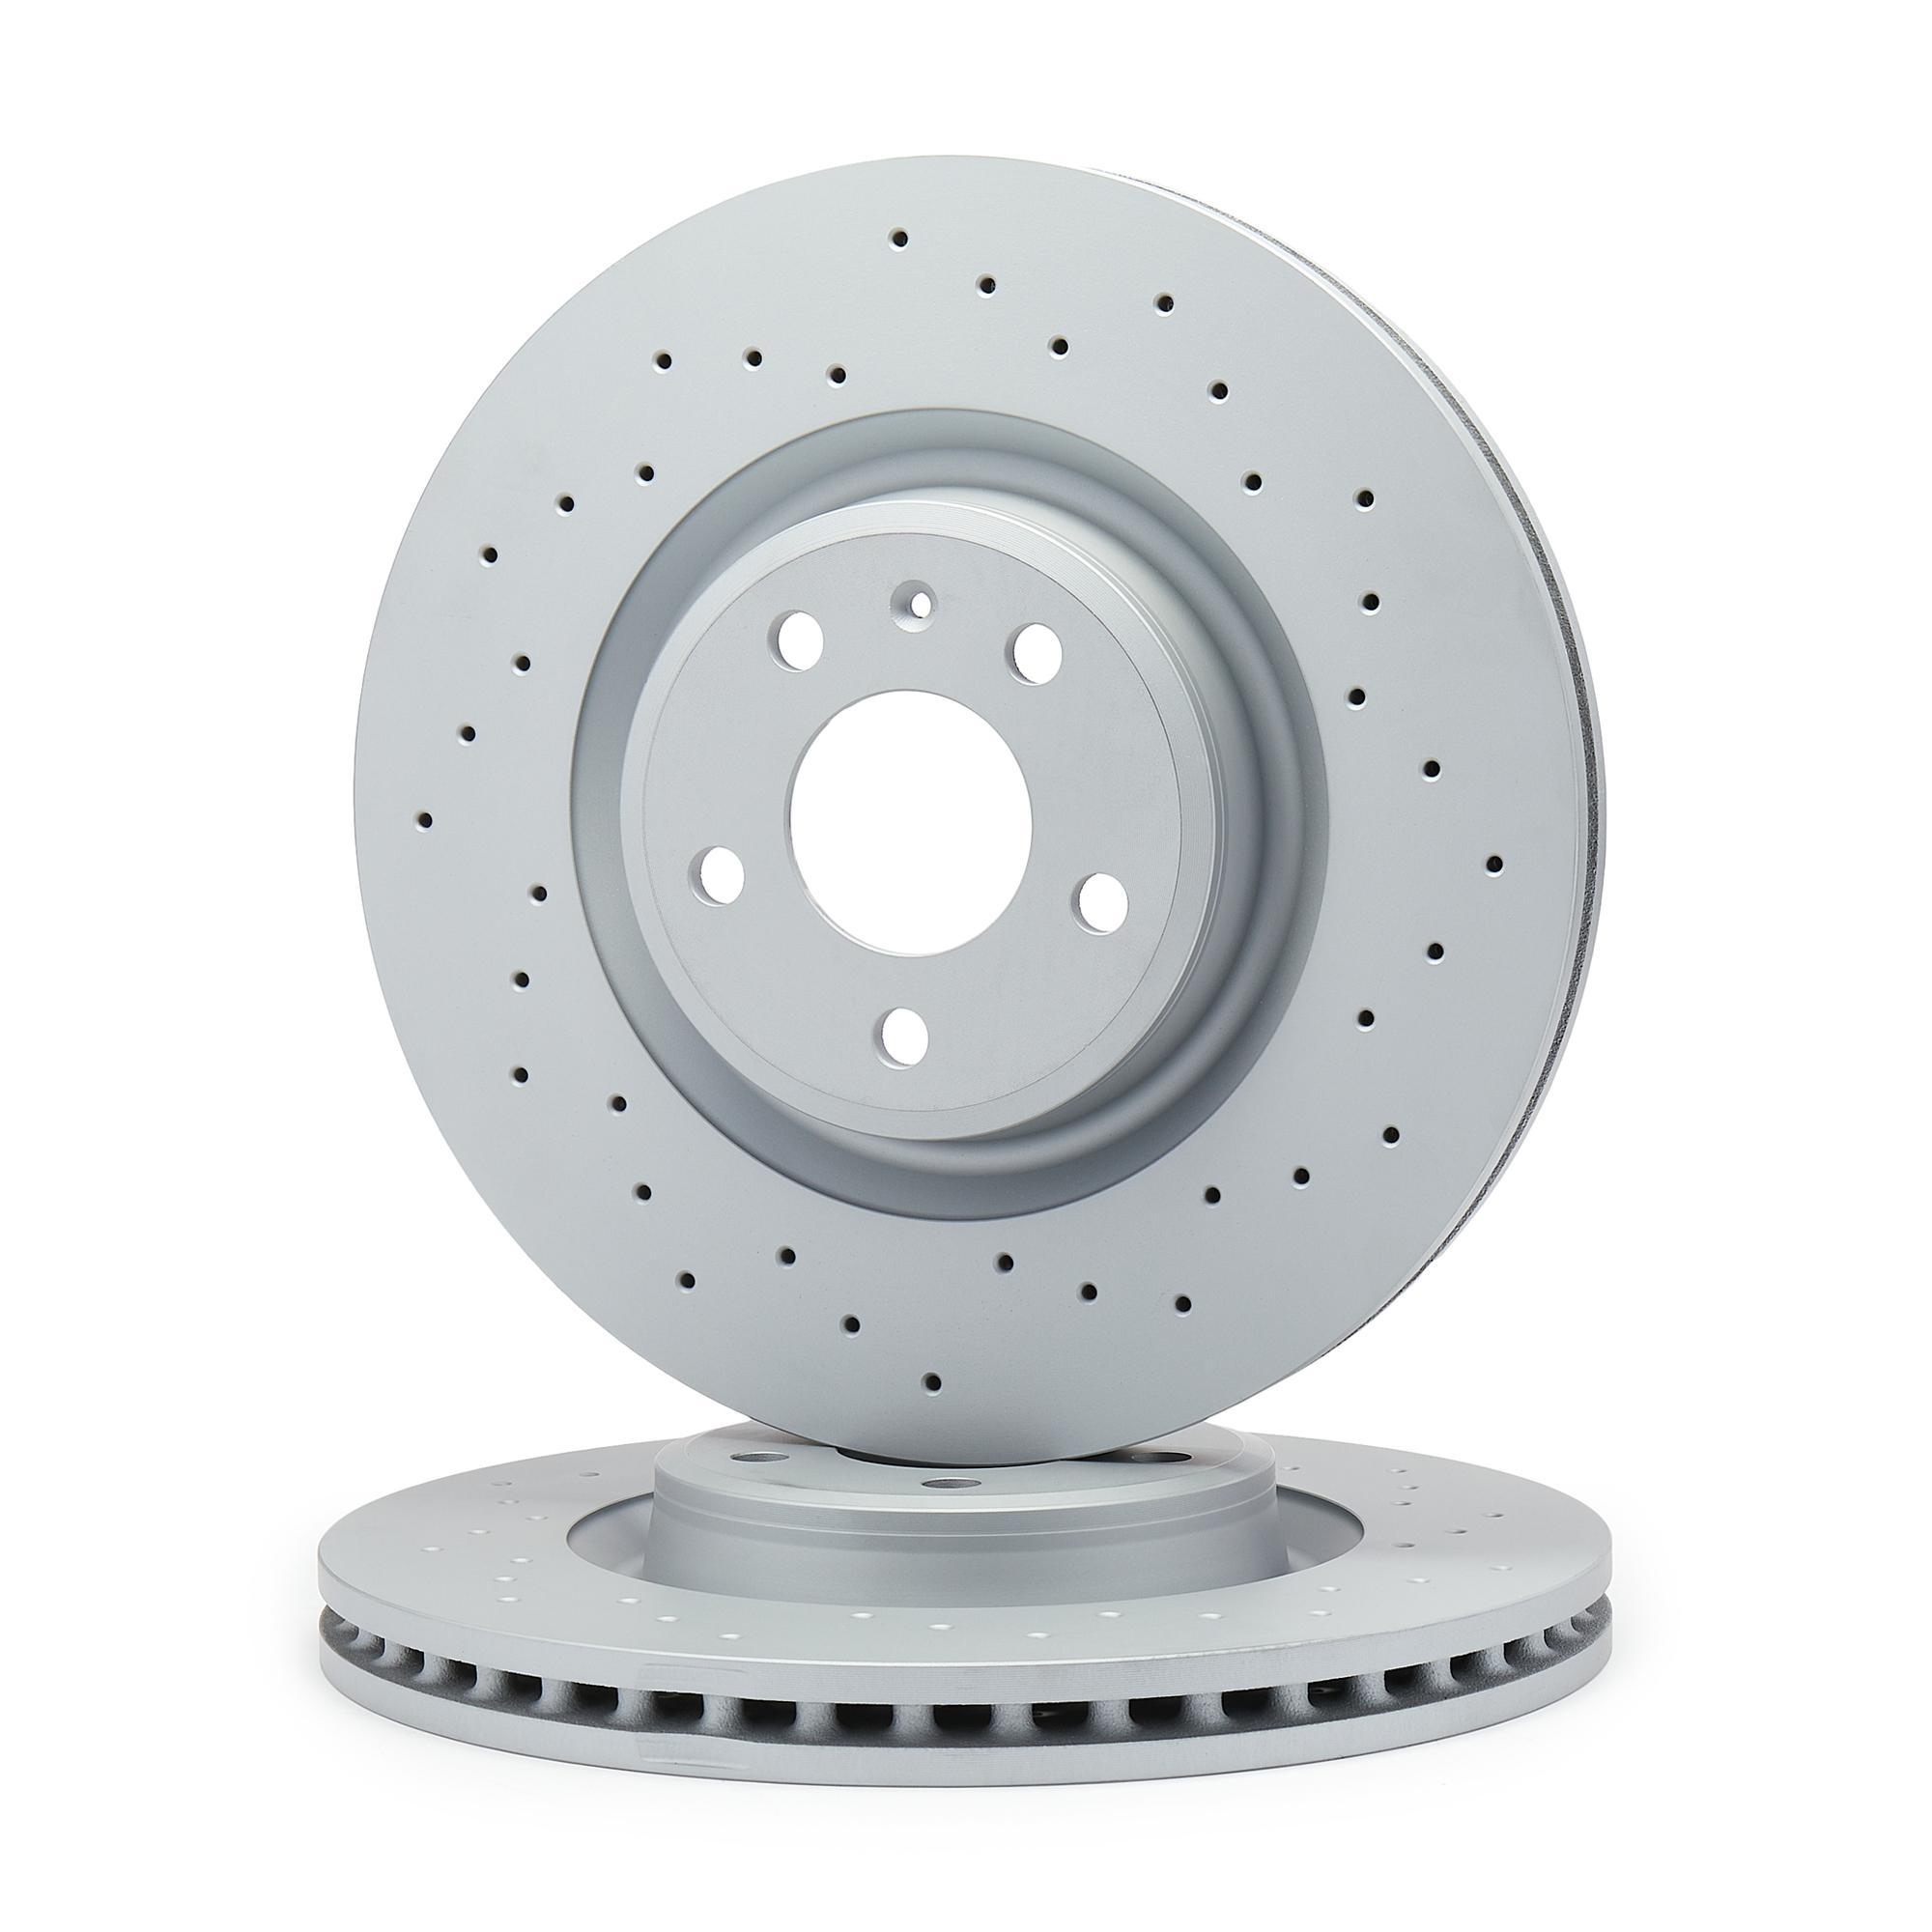 Buy original Brake disc set ZIMMERMANN 100.3356.52